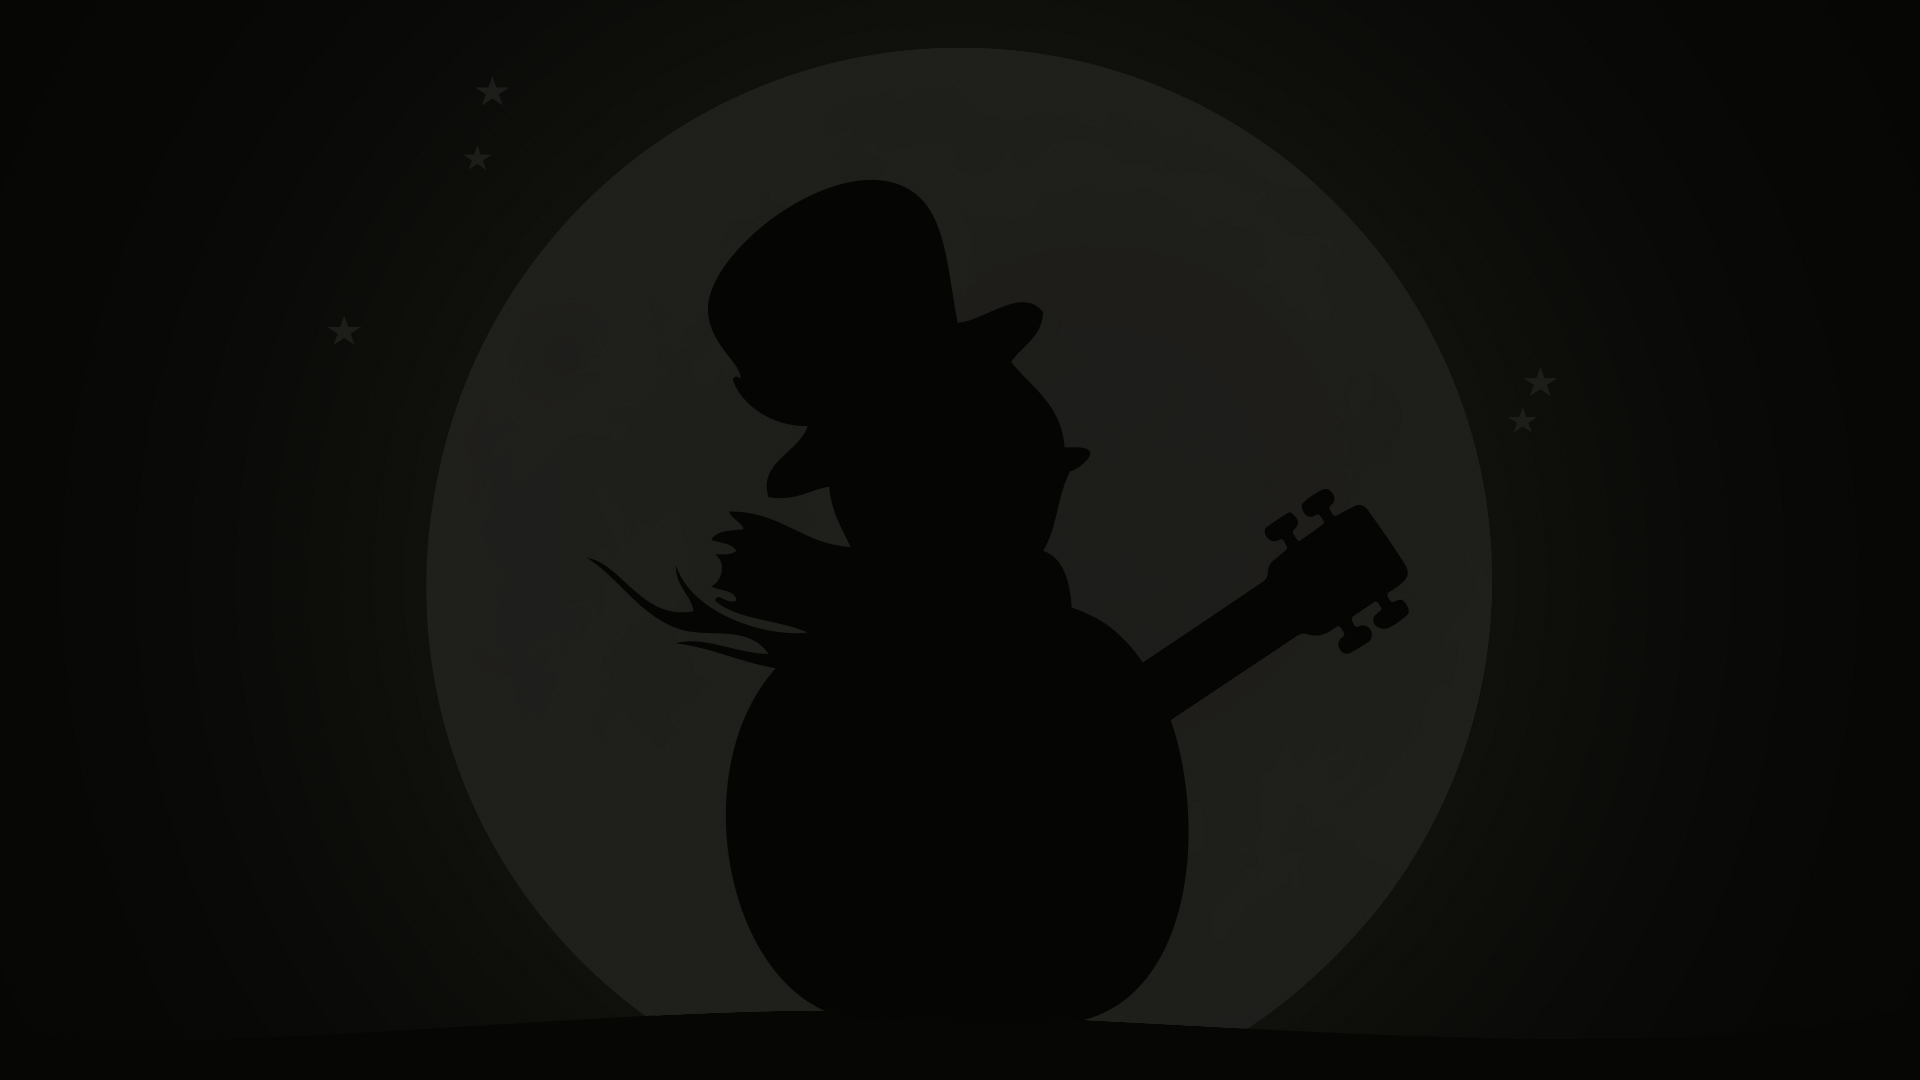 1920x1080-Sneeuwpop2017-Web-BG